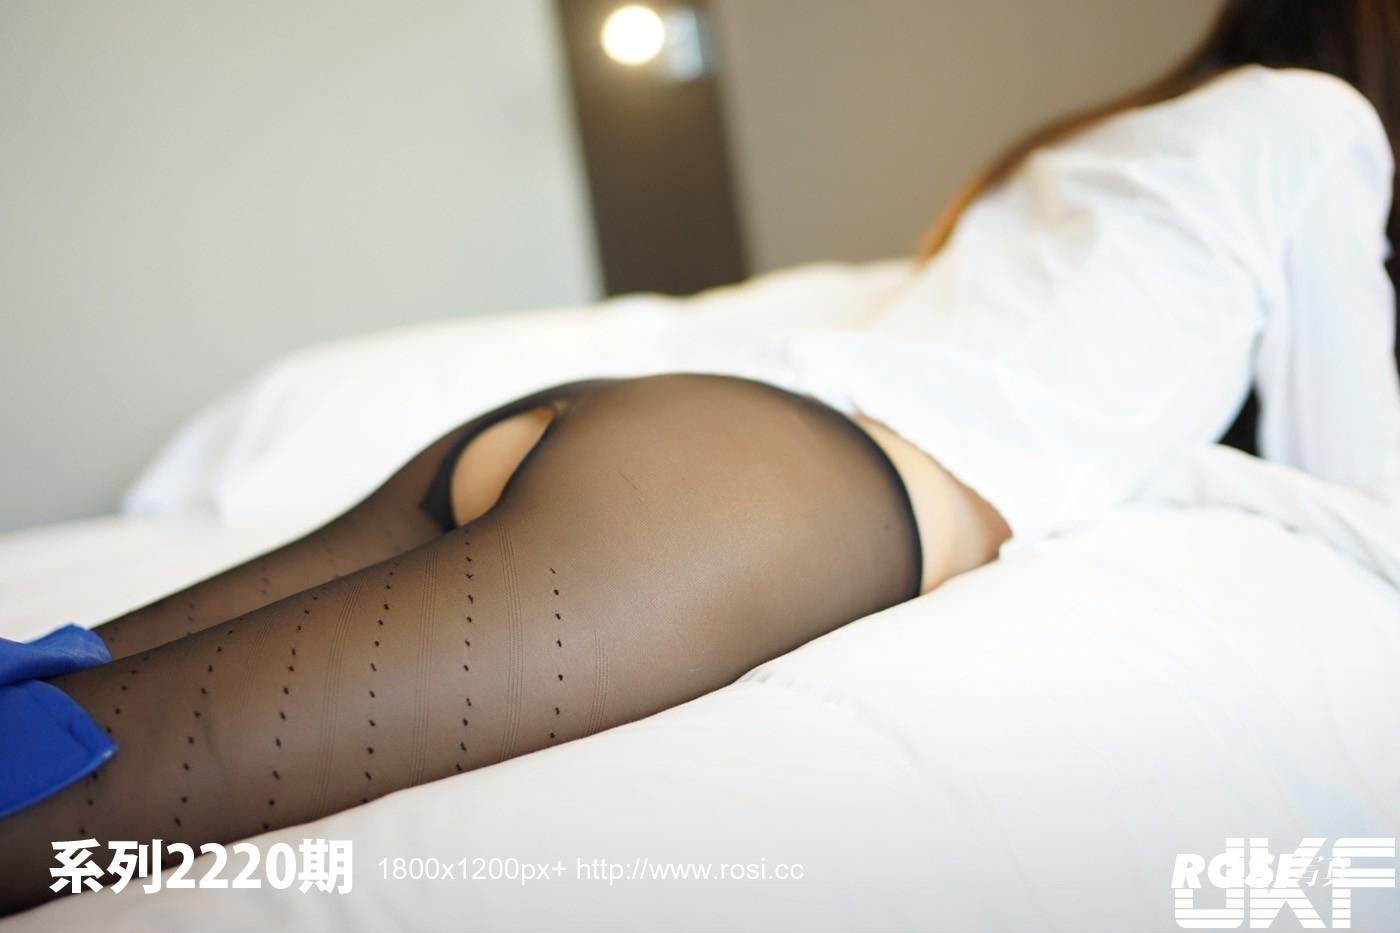 【ROSI寫真系列】2018.01.04 No.2220長腿妹開檔絲襪無內直穿【33P】 - 貼圖 - 絲襪美腿 -